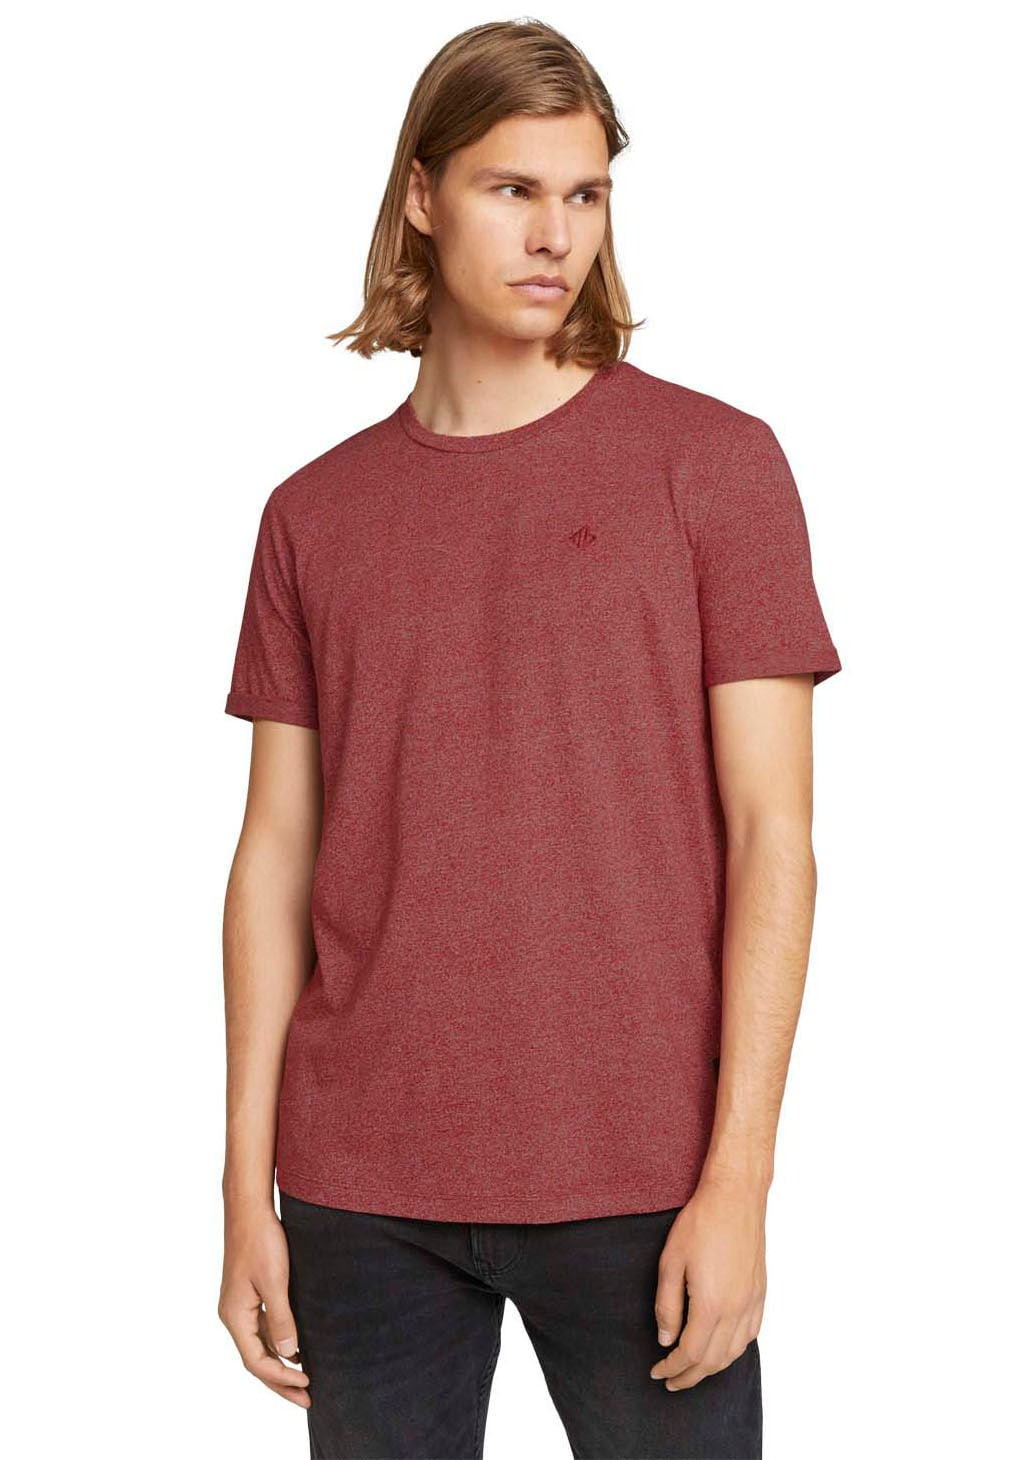 tom tailor denim -  T-Shirt, mit Strukturmuster